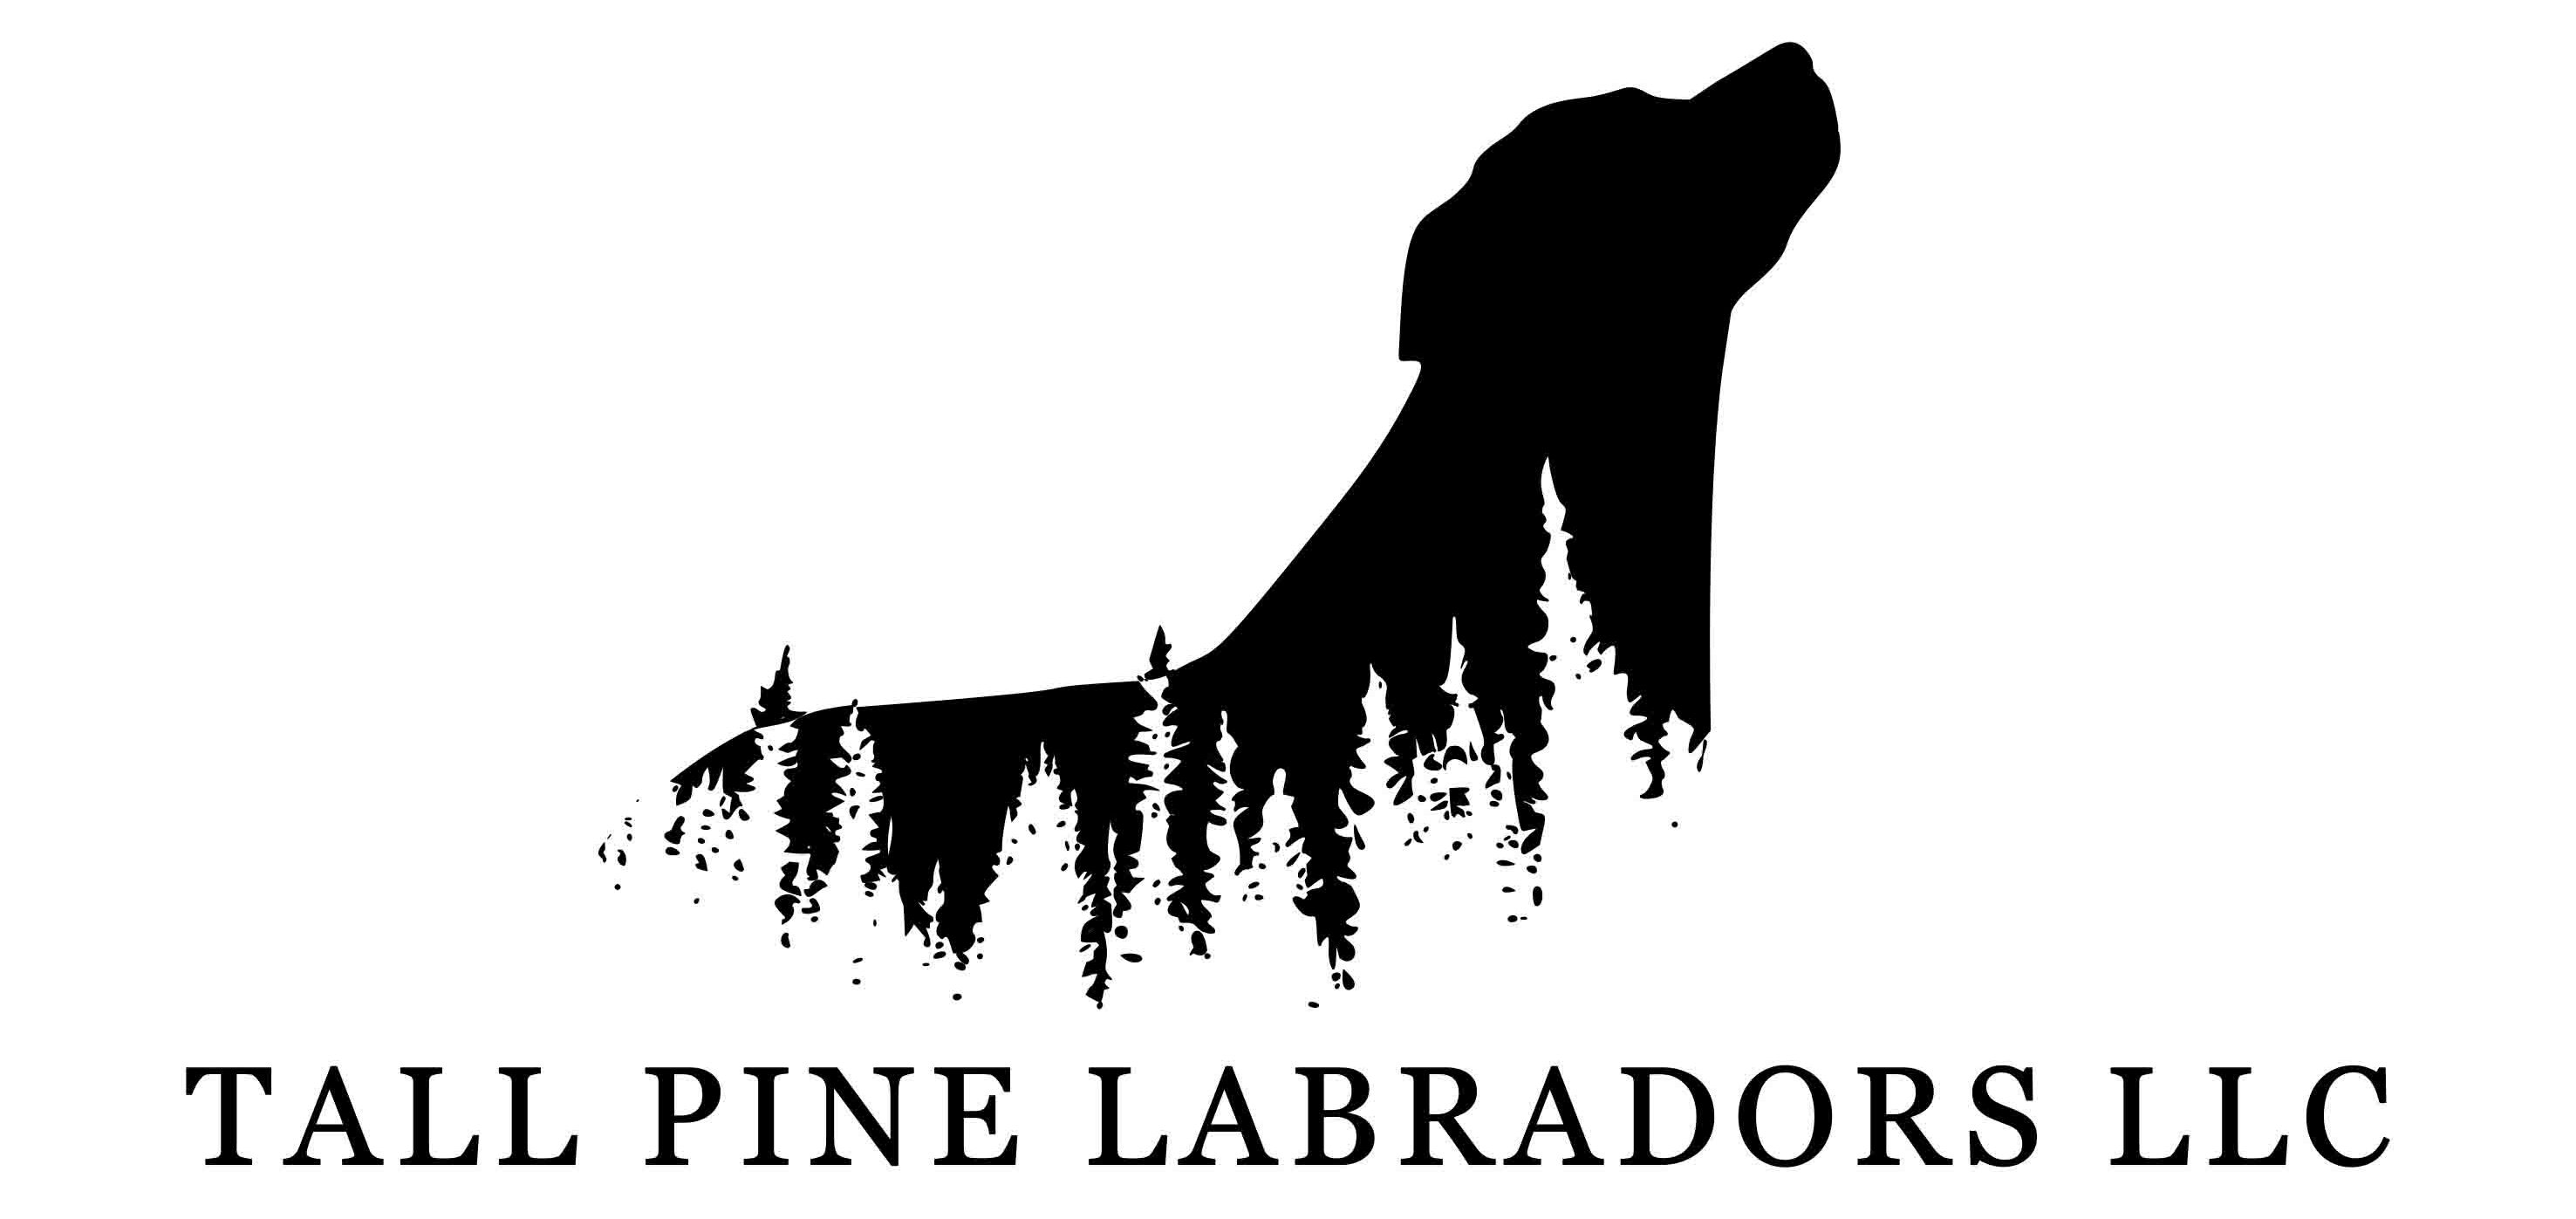 Tall Pine Labradors LLC